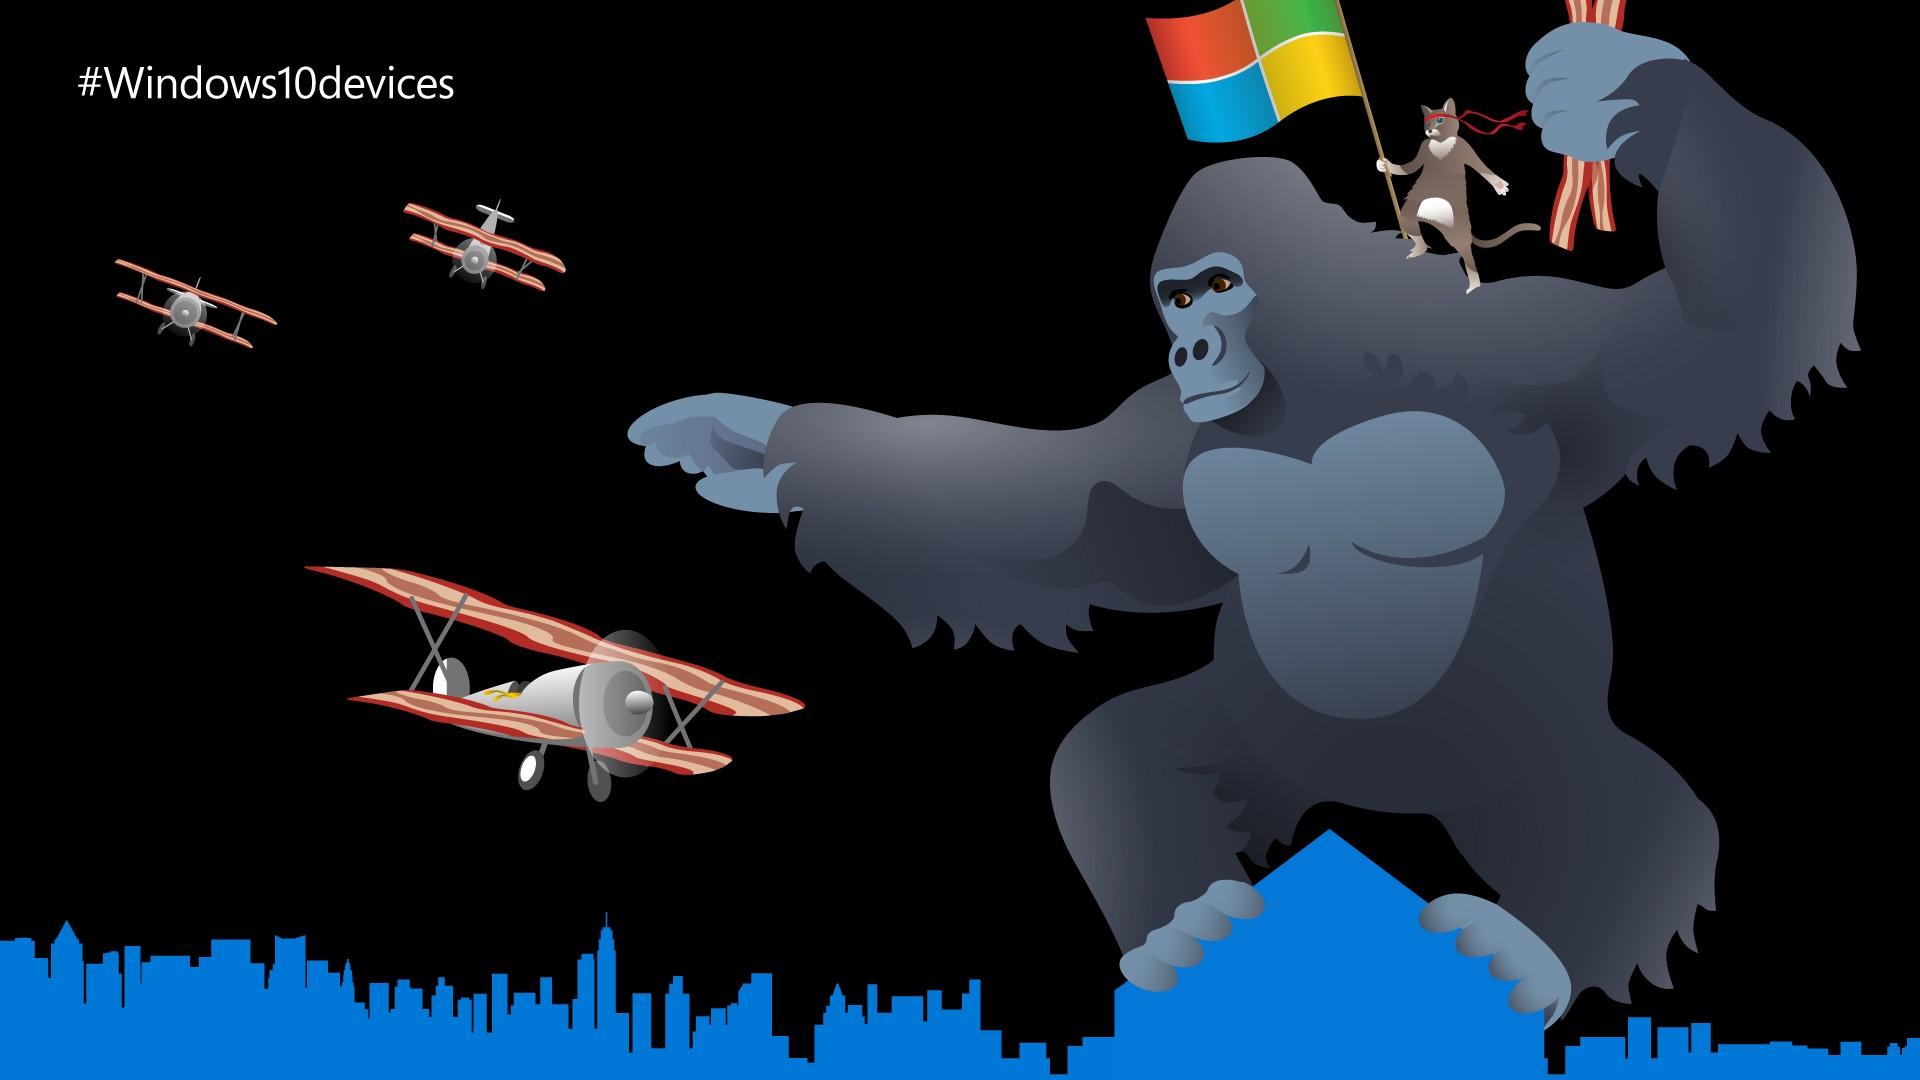 Microsoft Hides Ninja Cat Wallpaper in Windows 10 Devices Event 1920x1080